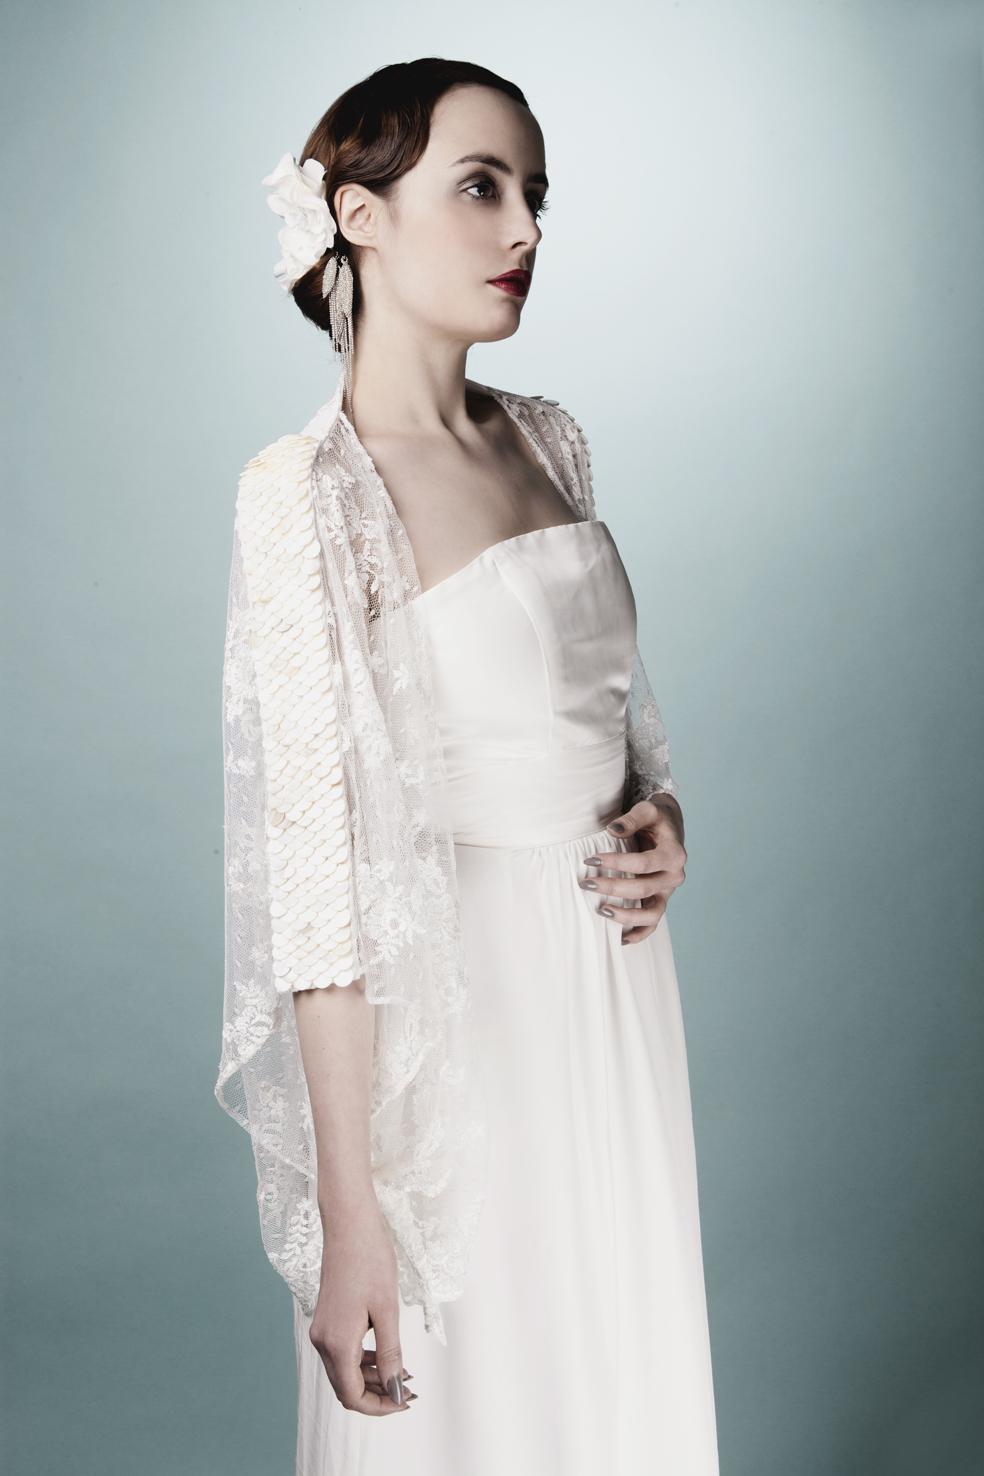 ©Pauline Darley - Tand3m - Robe a accessoiriser - La mariee aux pieds nus